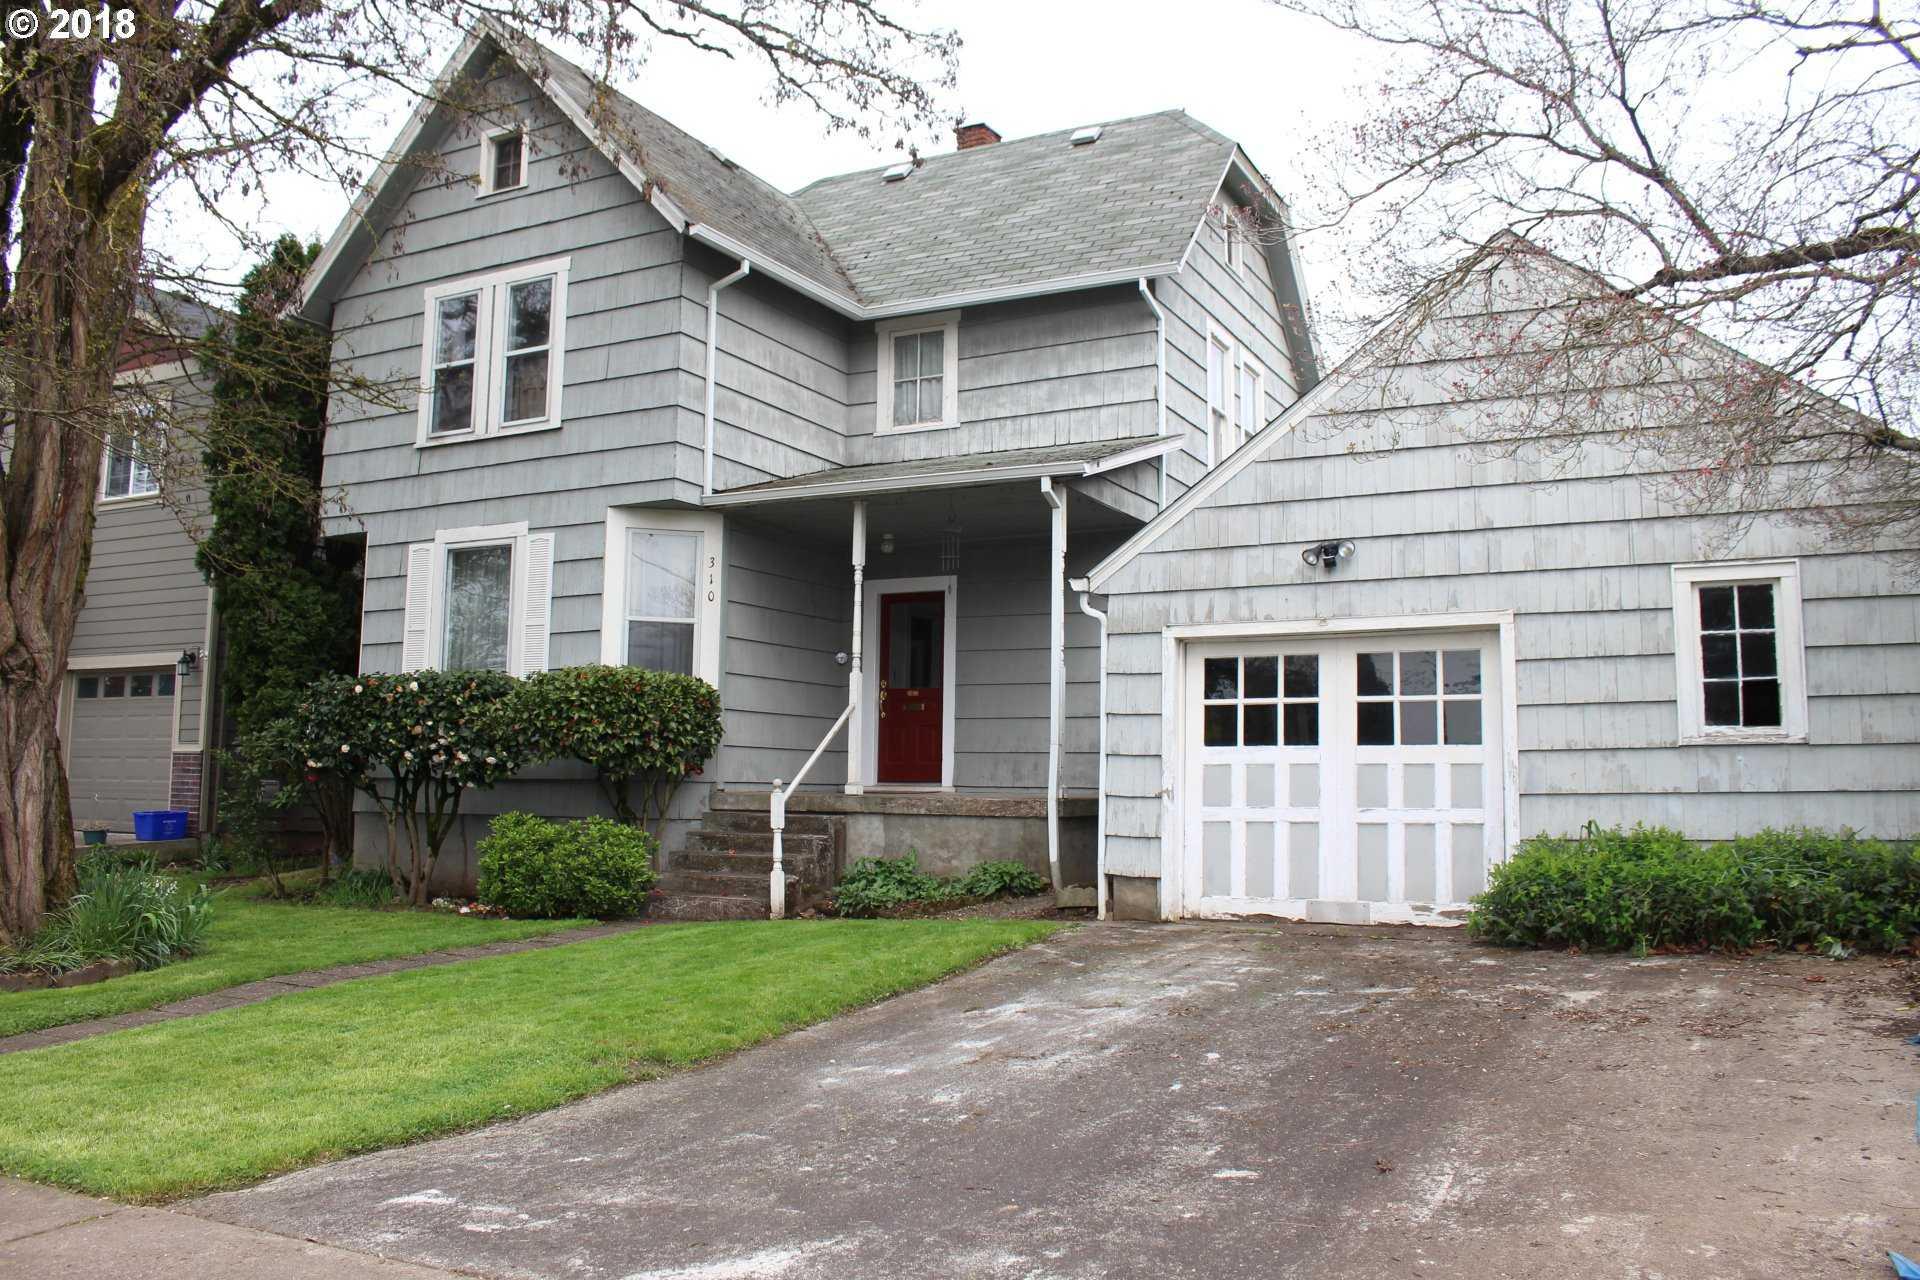 $299,900 - 4Br/1Ba -  for Sale in Gladstone